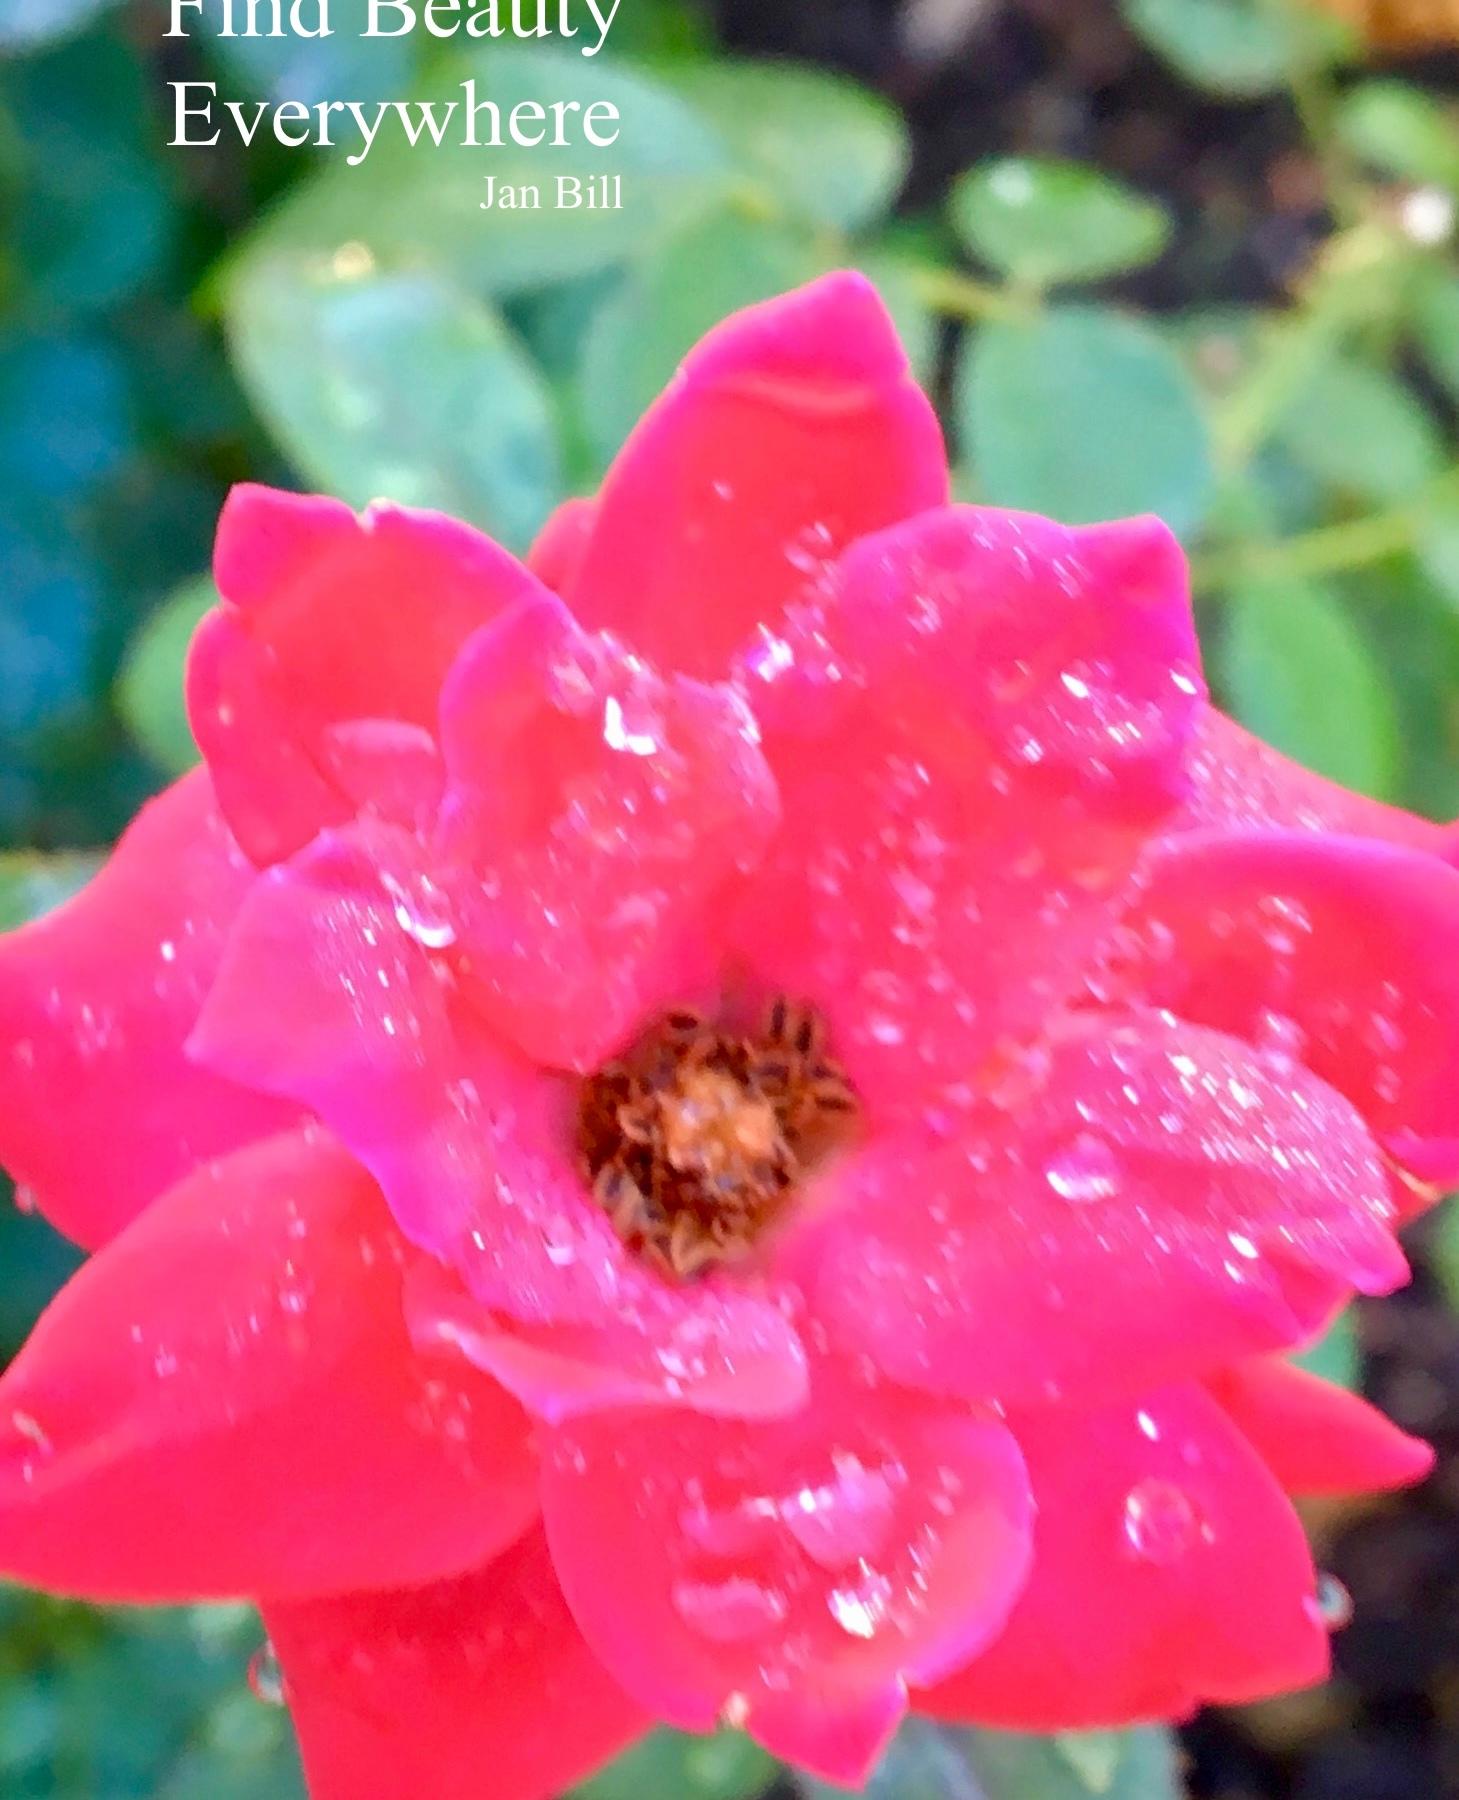 image of pink teacup rose